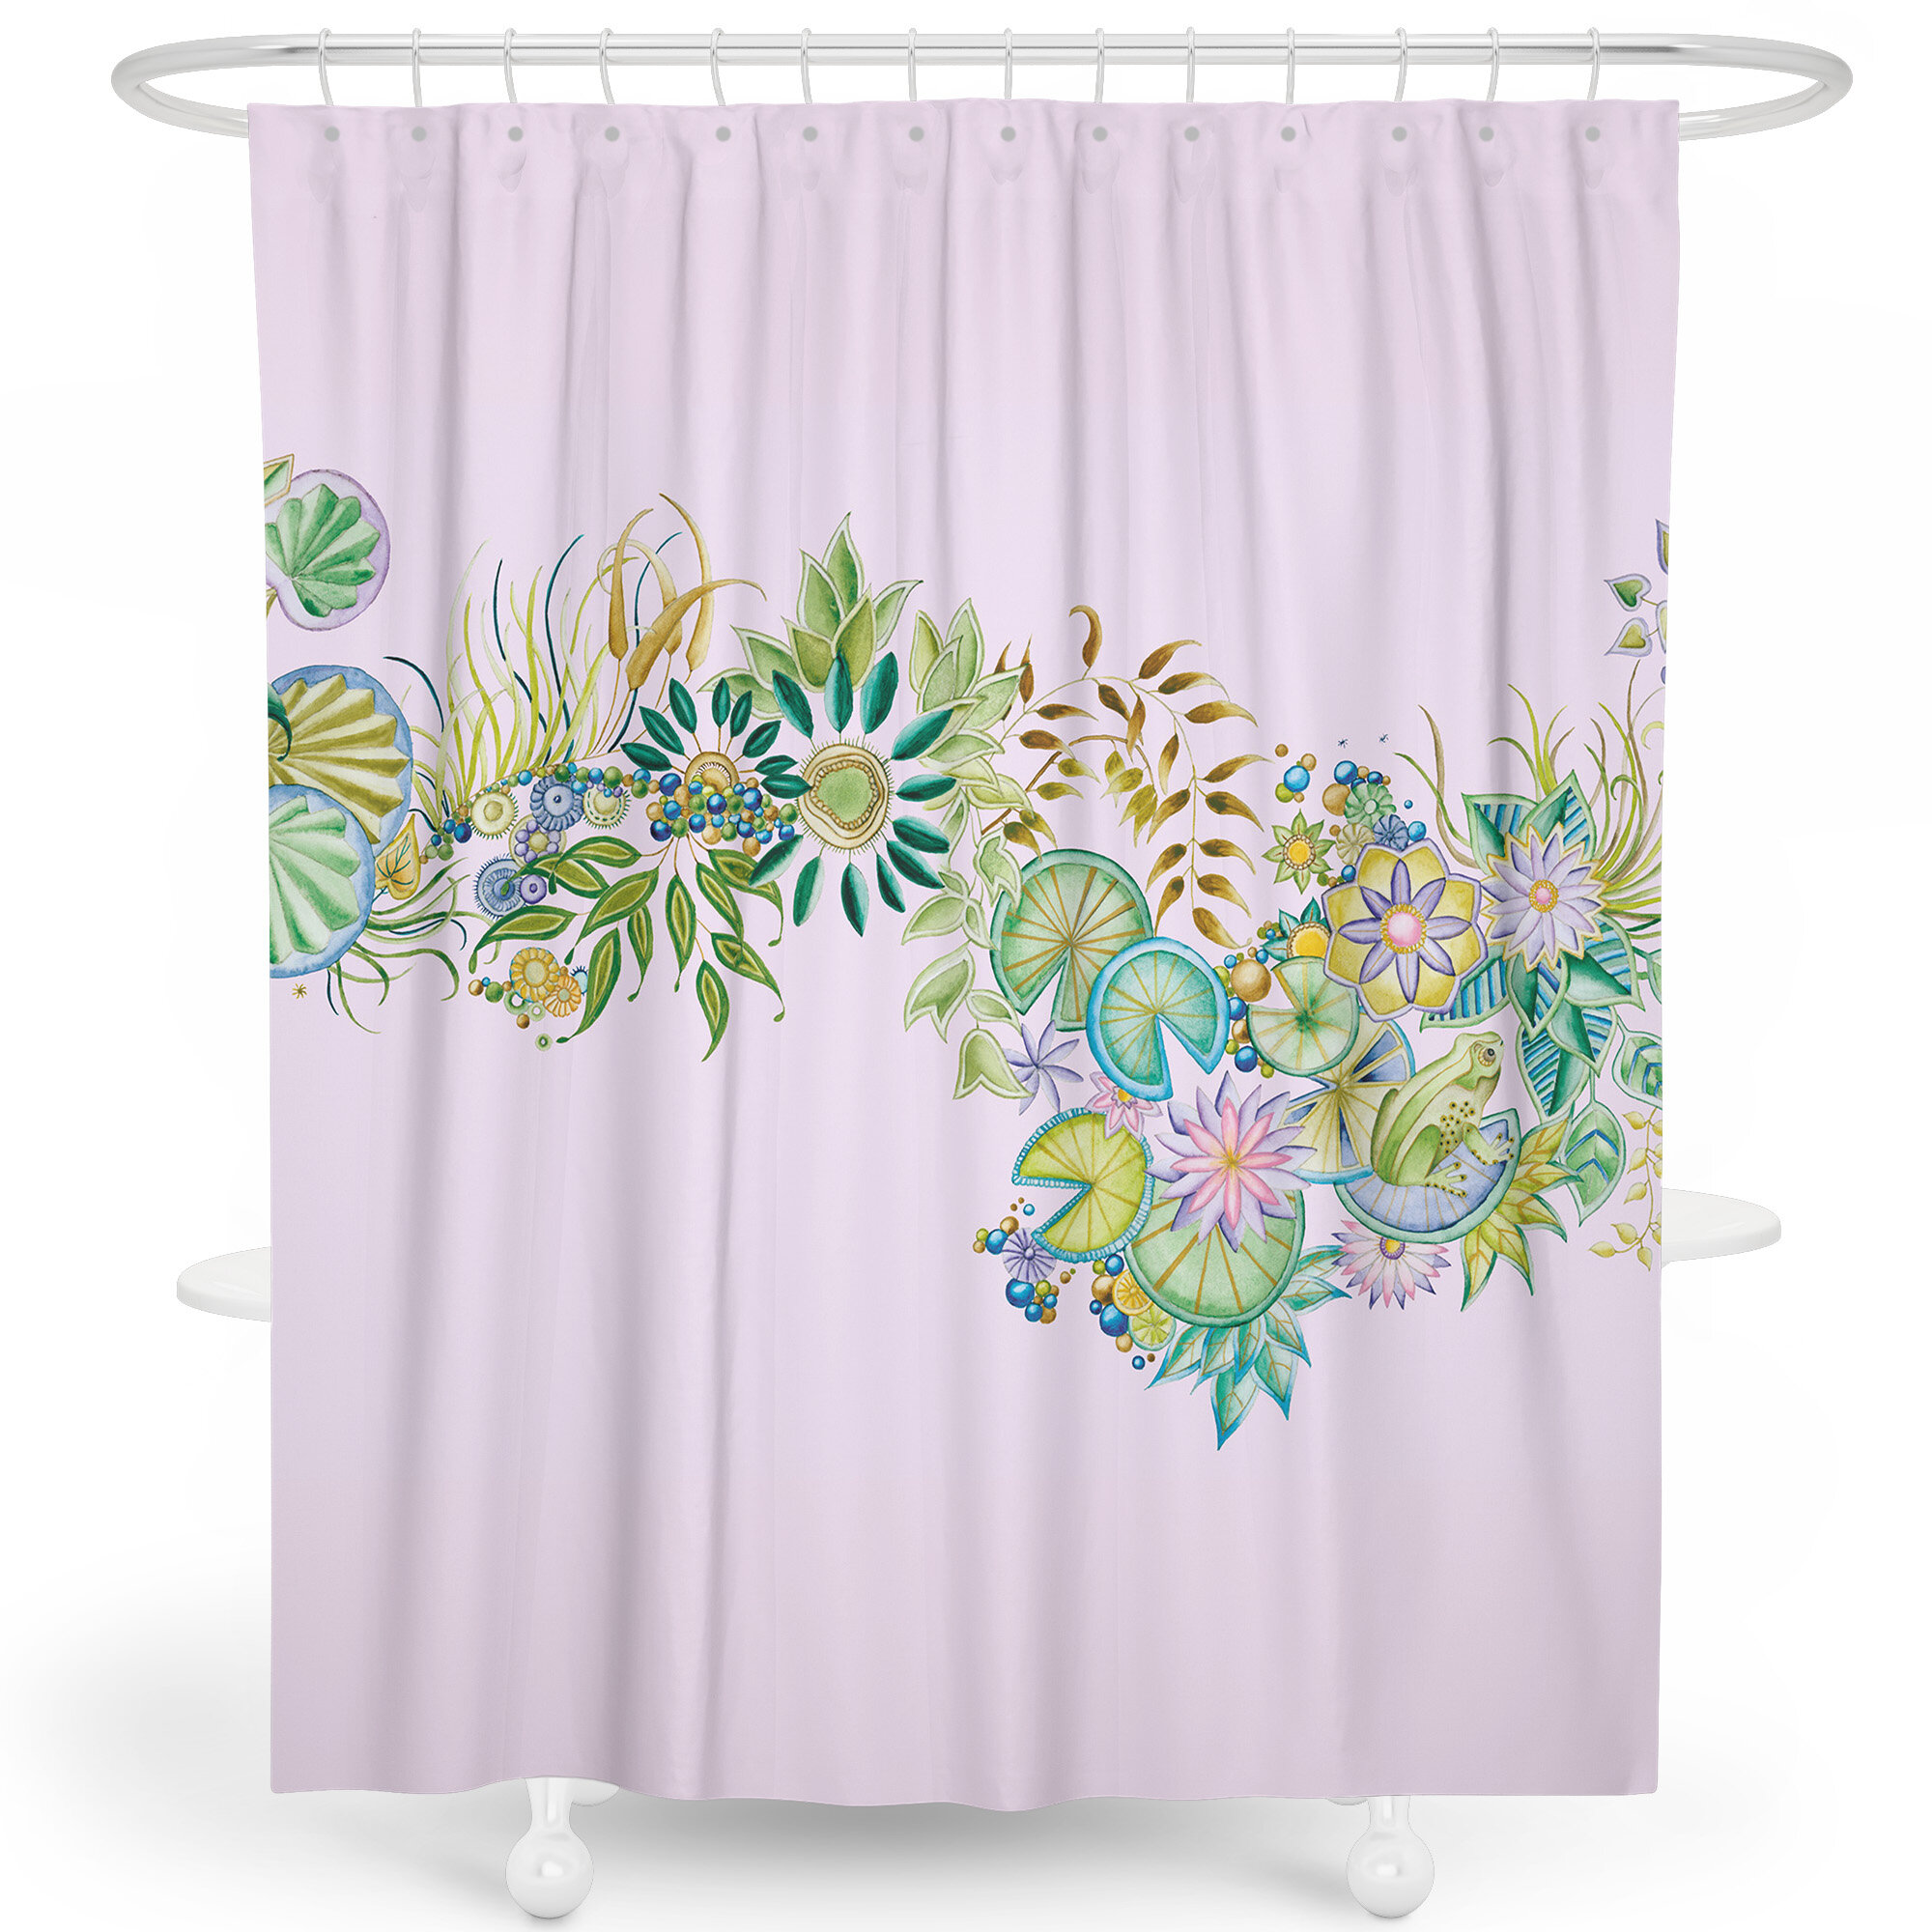 Margareta Tropical Plants Floral Single Shower Curtain Hooks